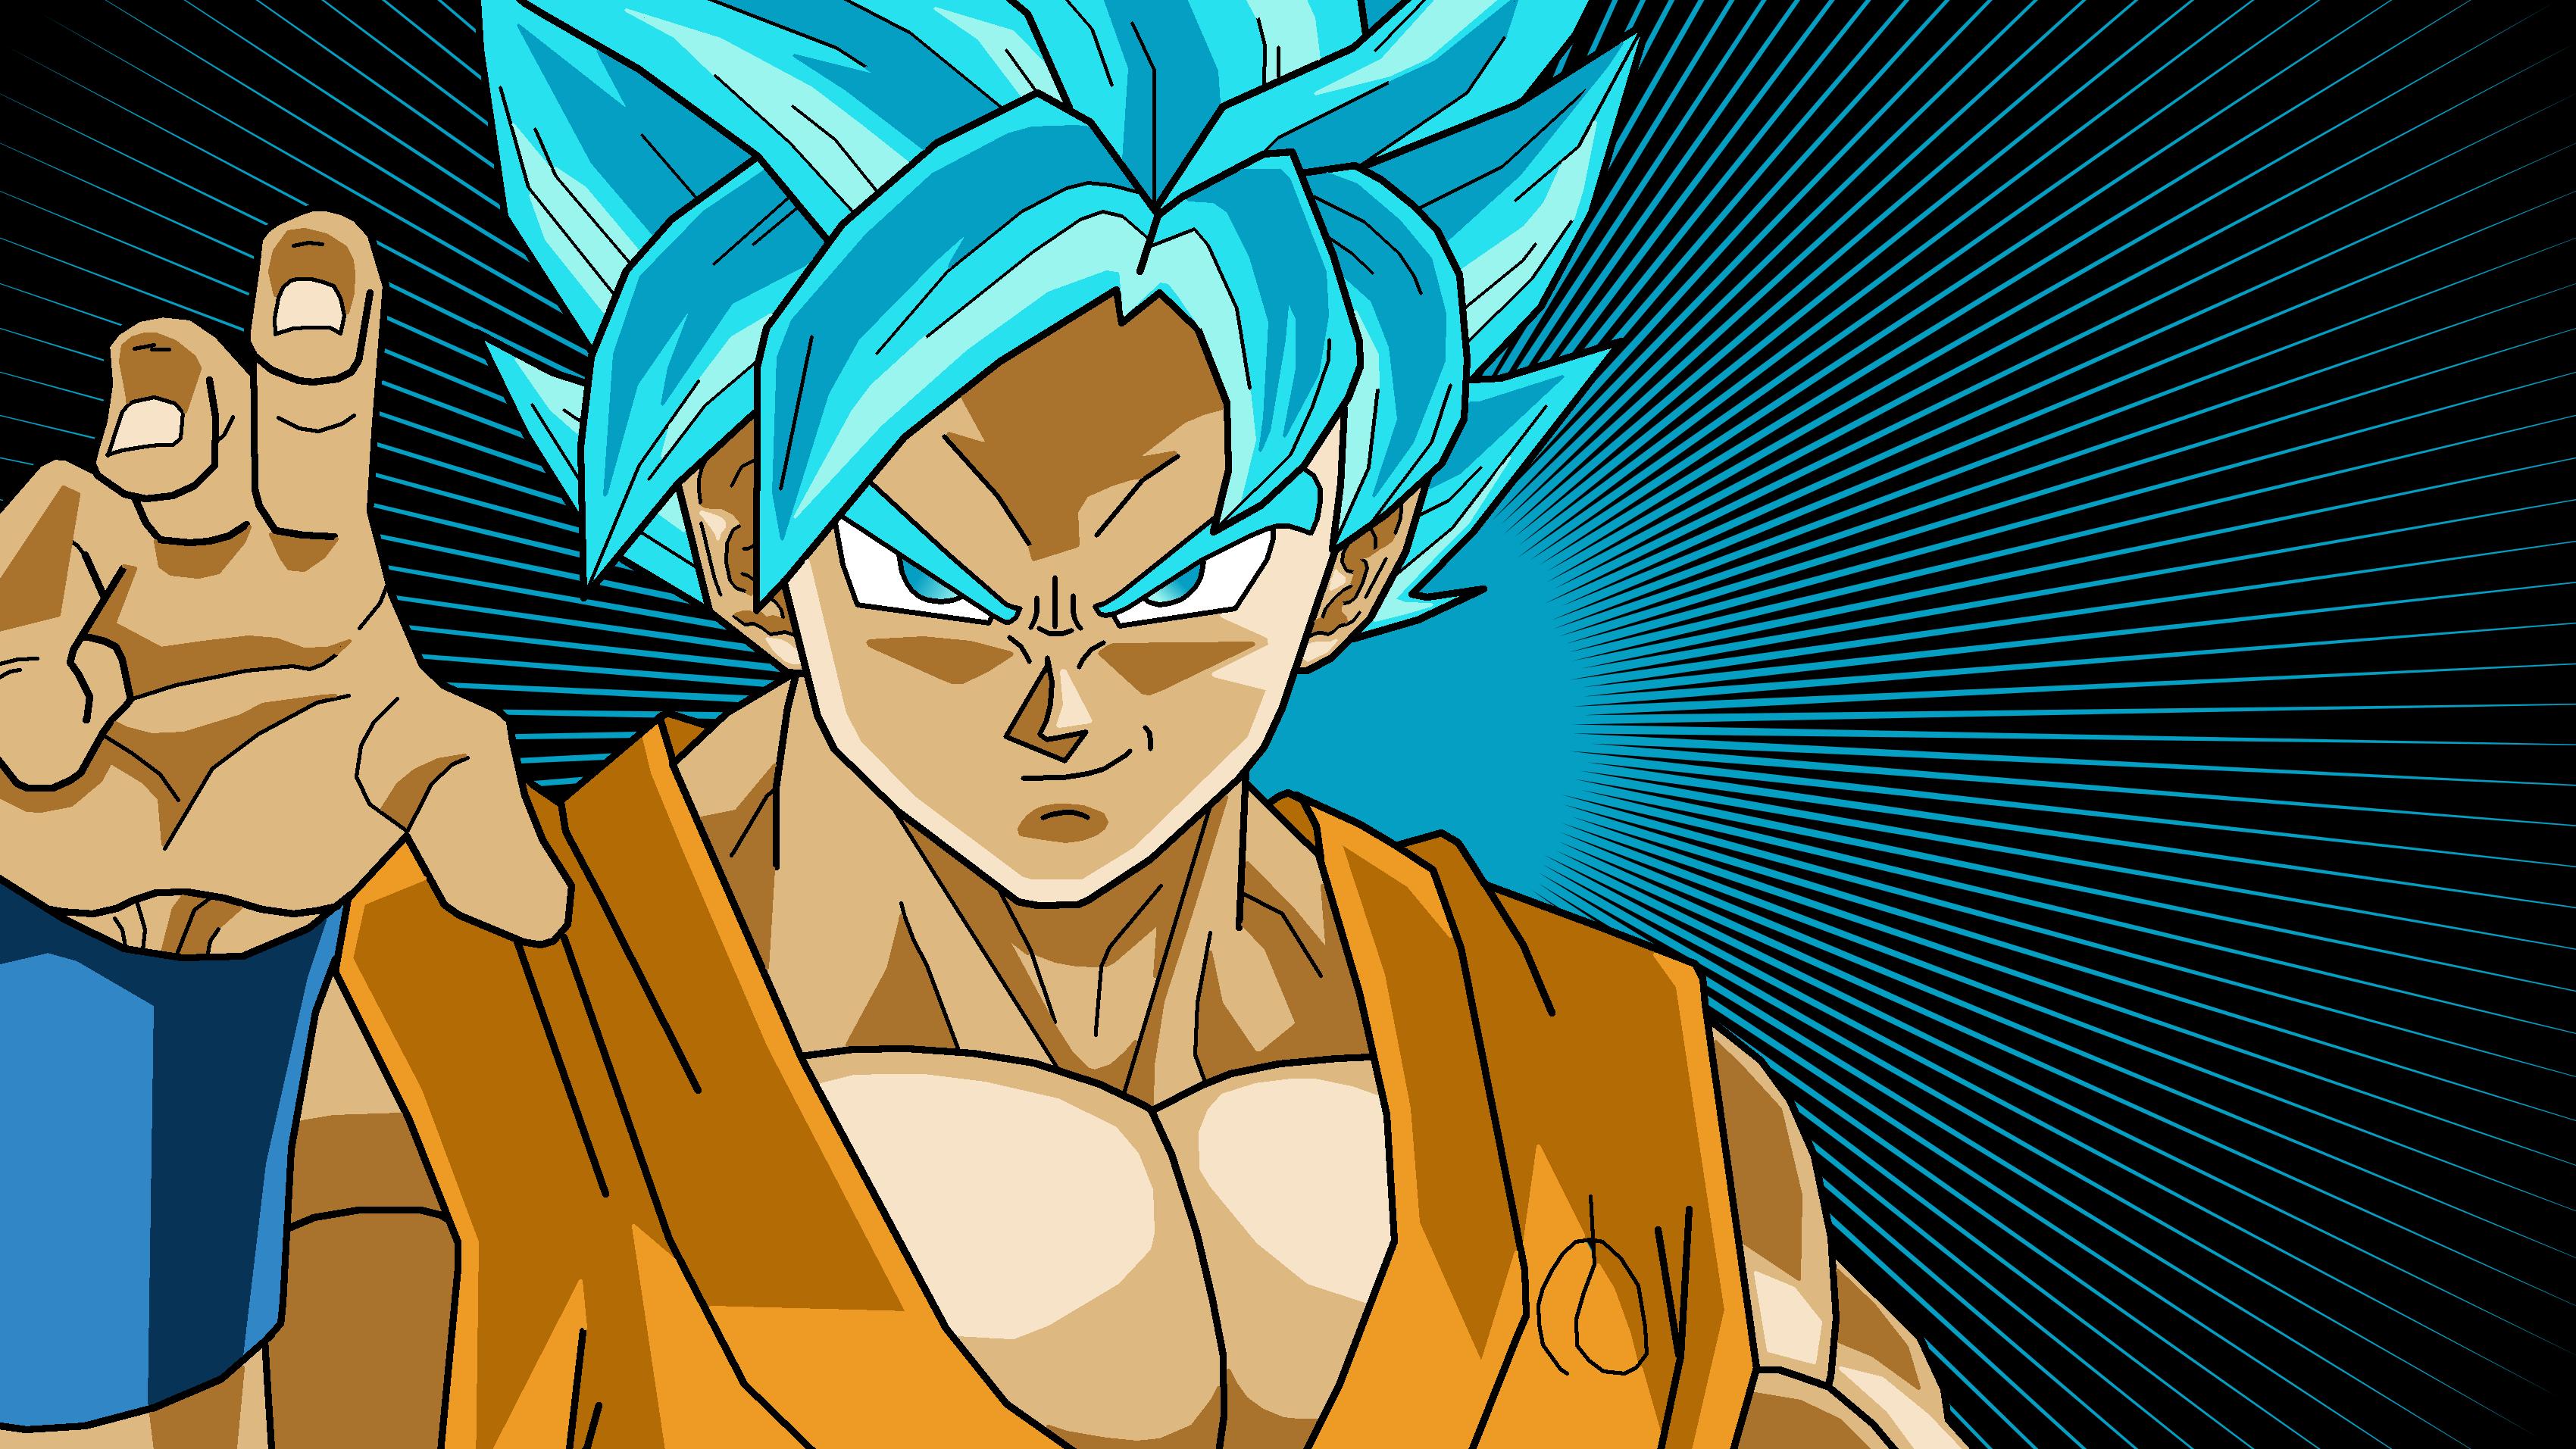 Wallpapers Goku Super Saiyan God